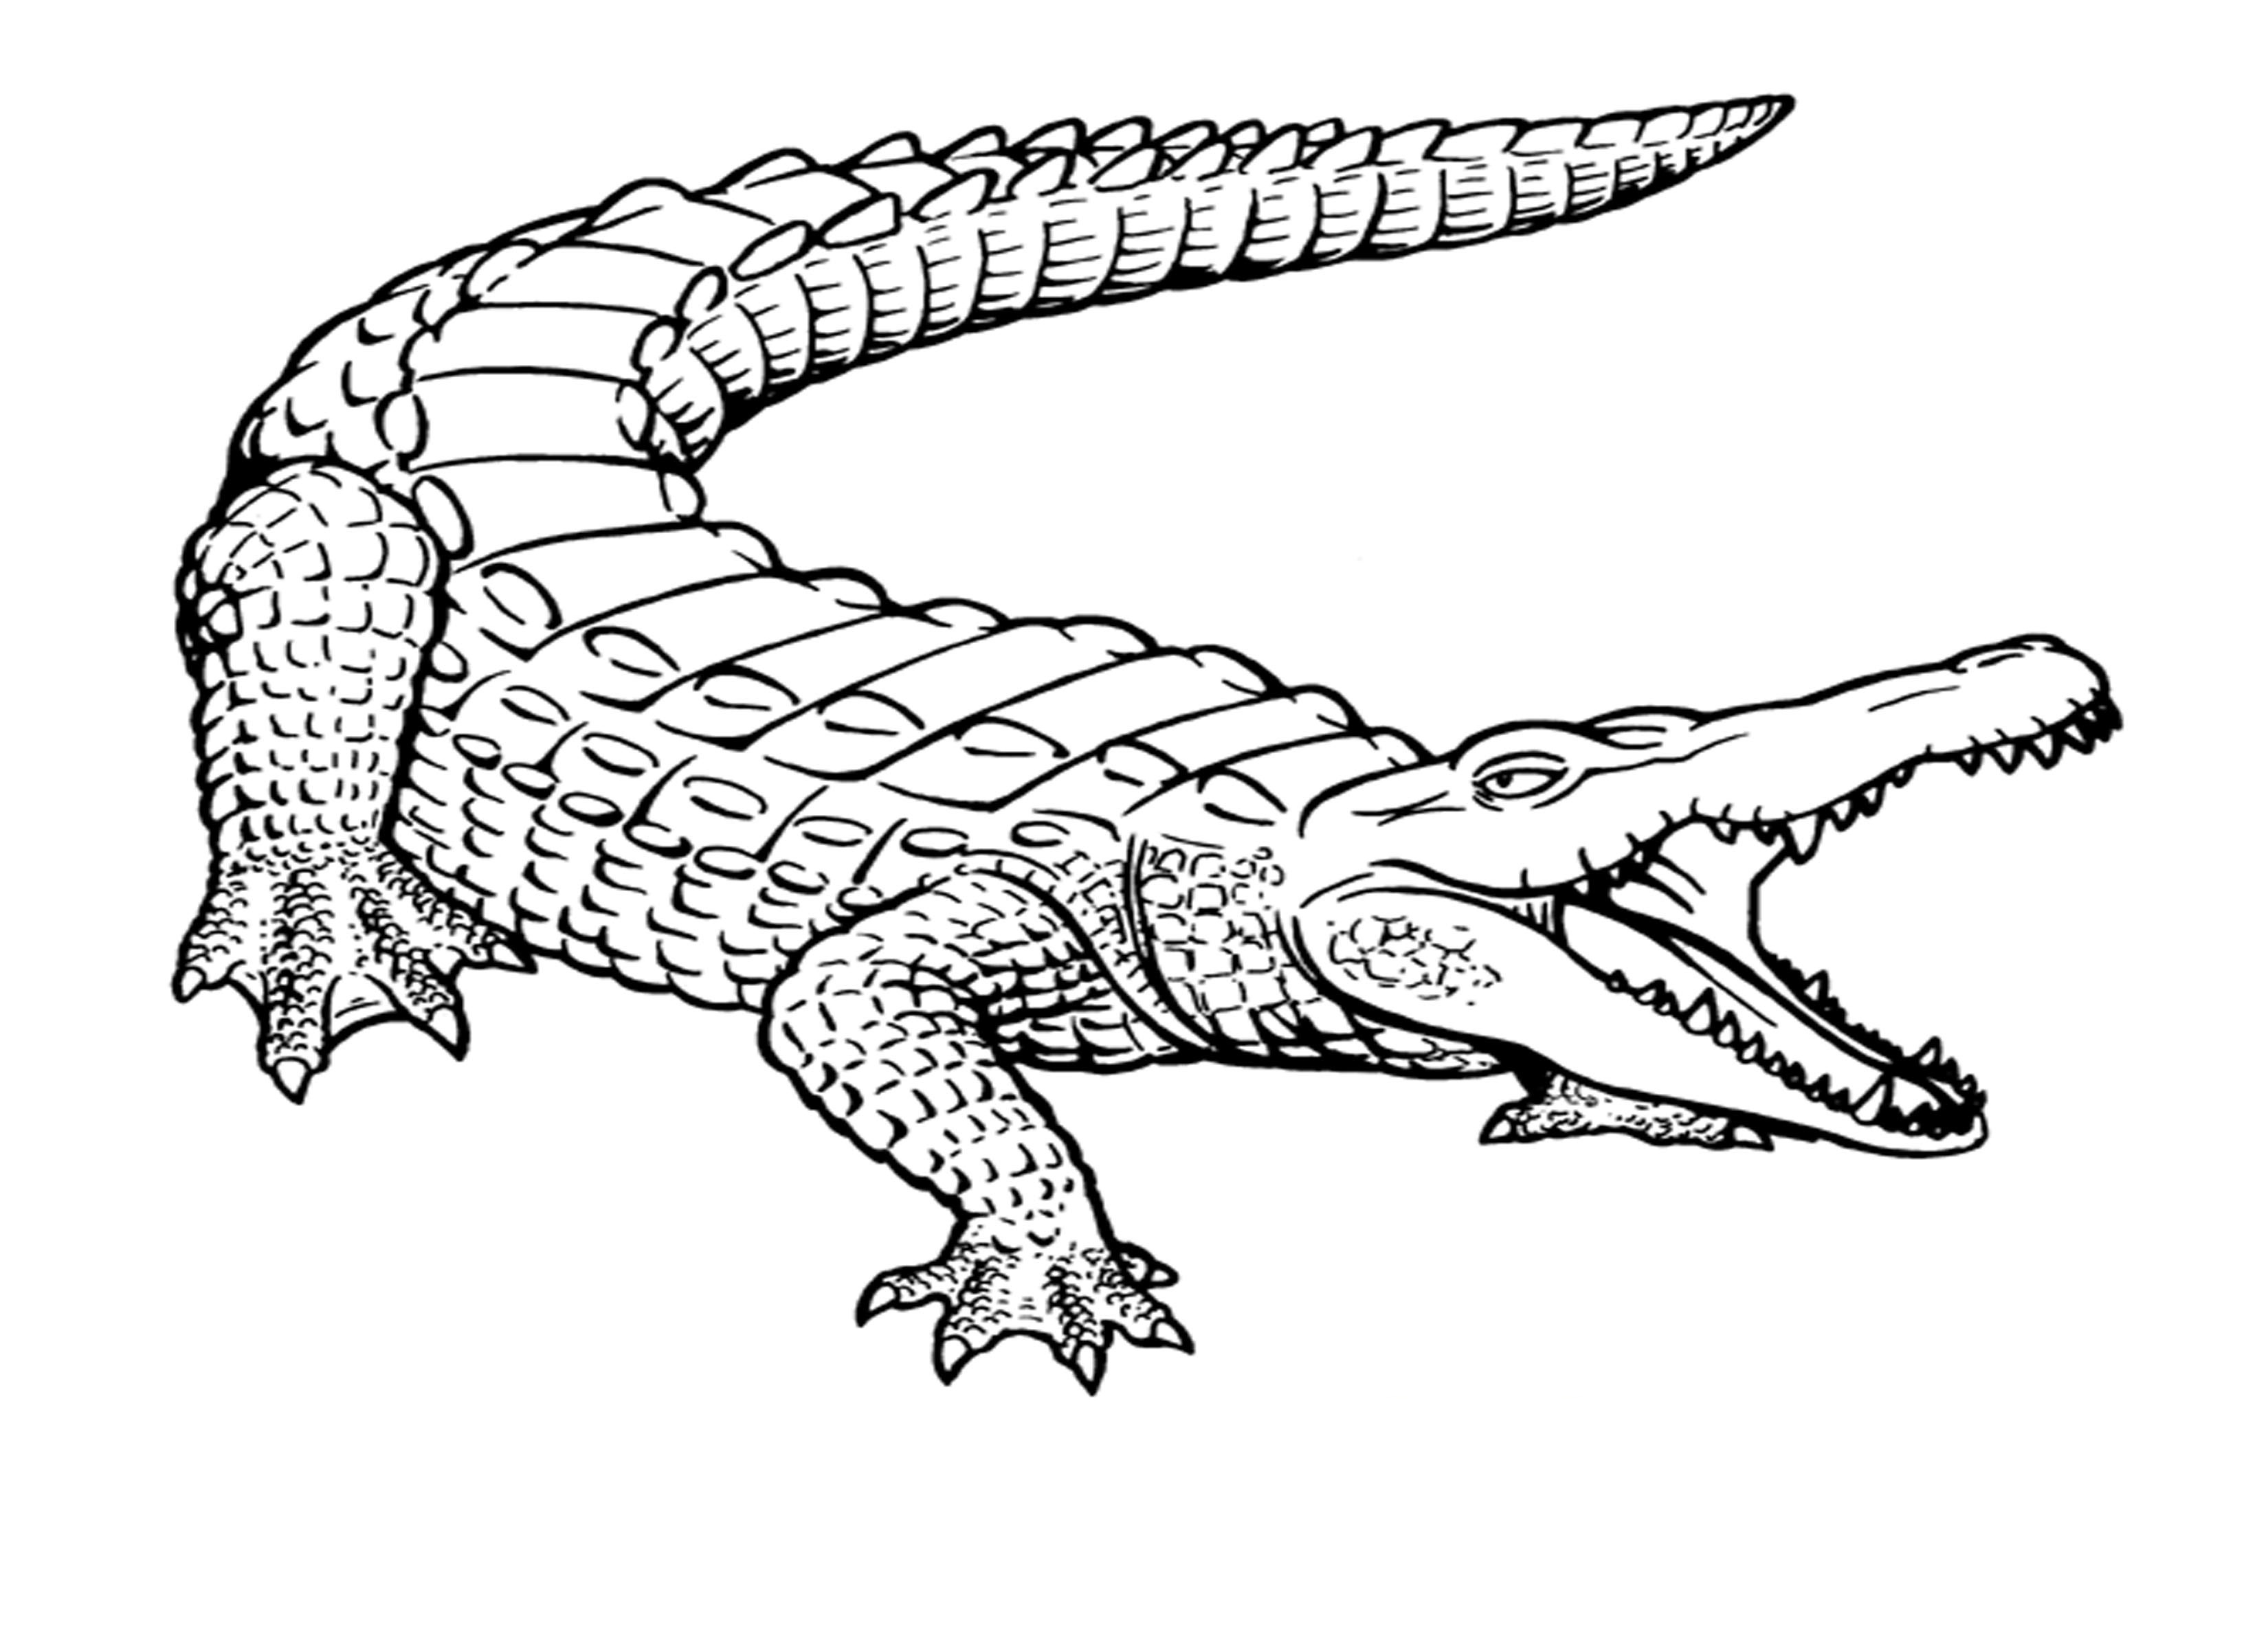 3300x2400 Crocodile Drawing For Kids How To Draw Cartoons Crocodile Easy